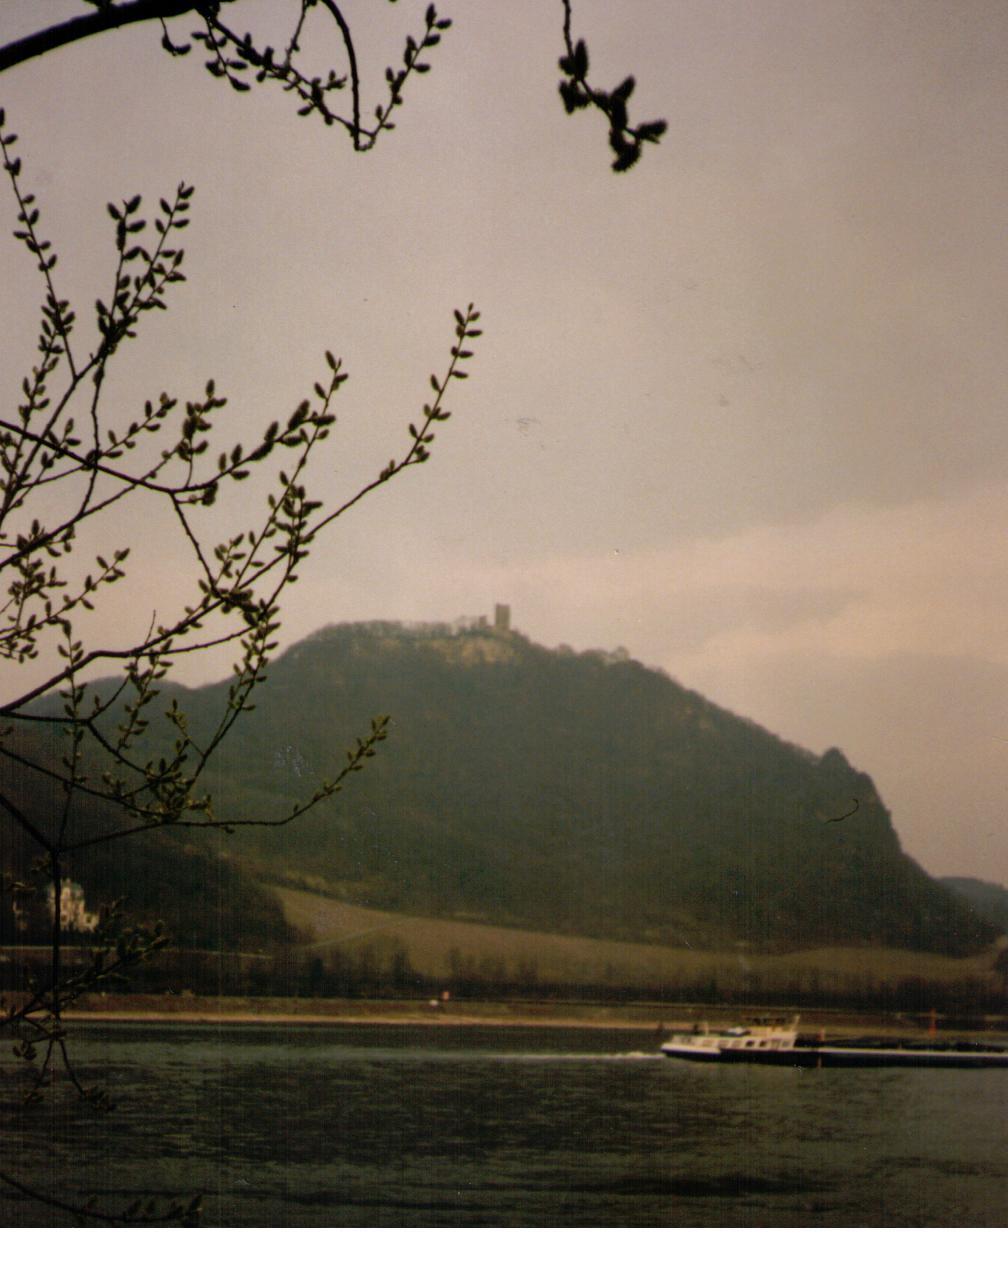 Drachenfels am Rhein